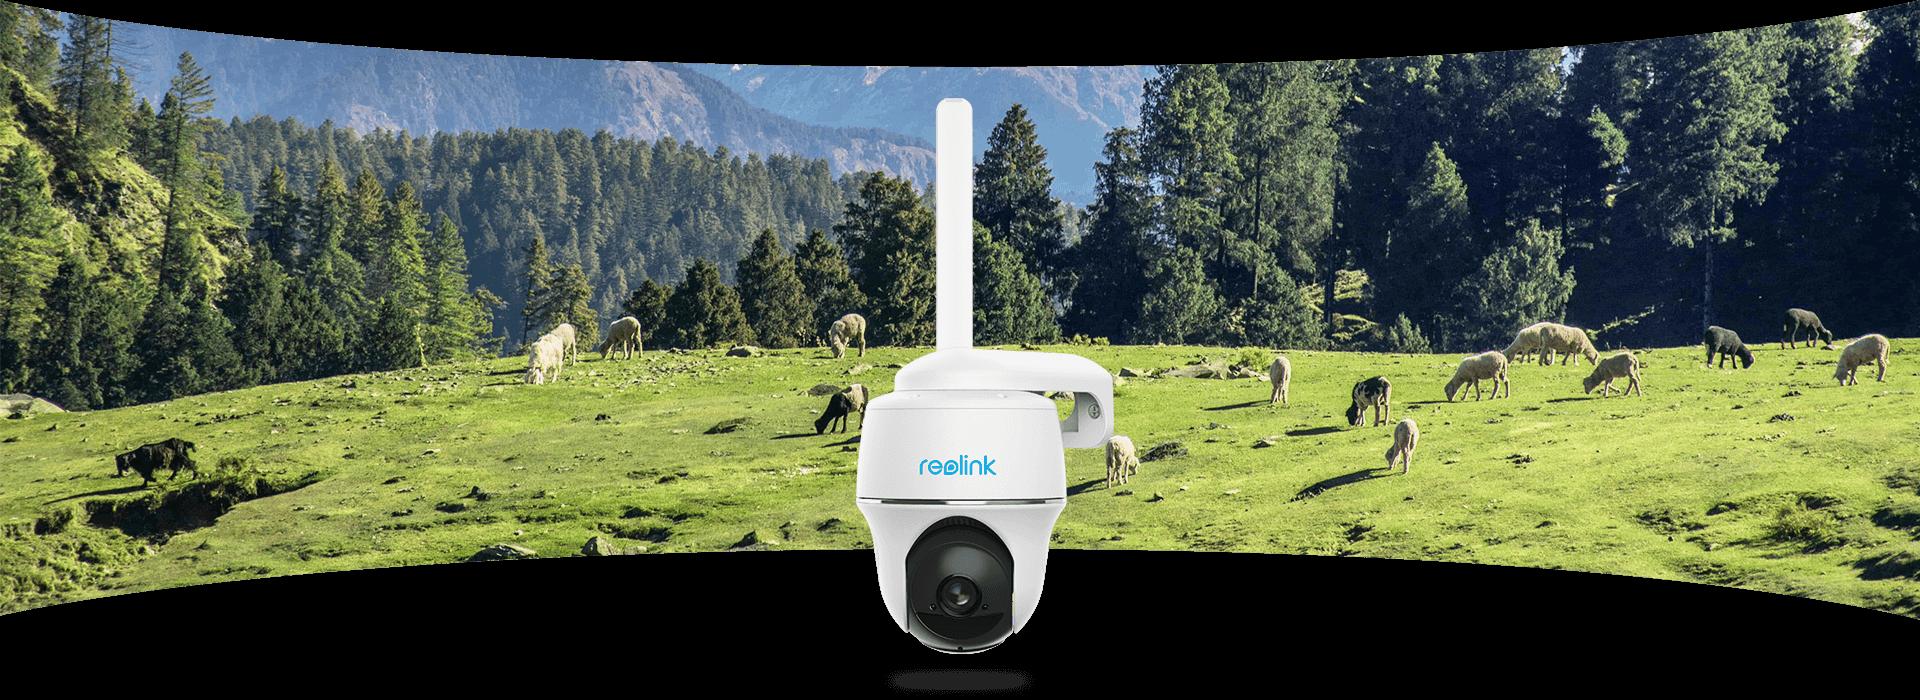 4G PT Outdoor-CCTV-Kamera mit ultraweitem Blickwinkel